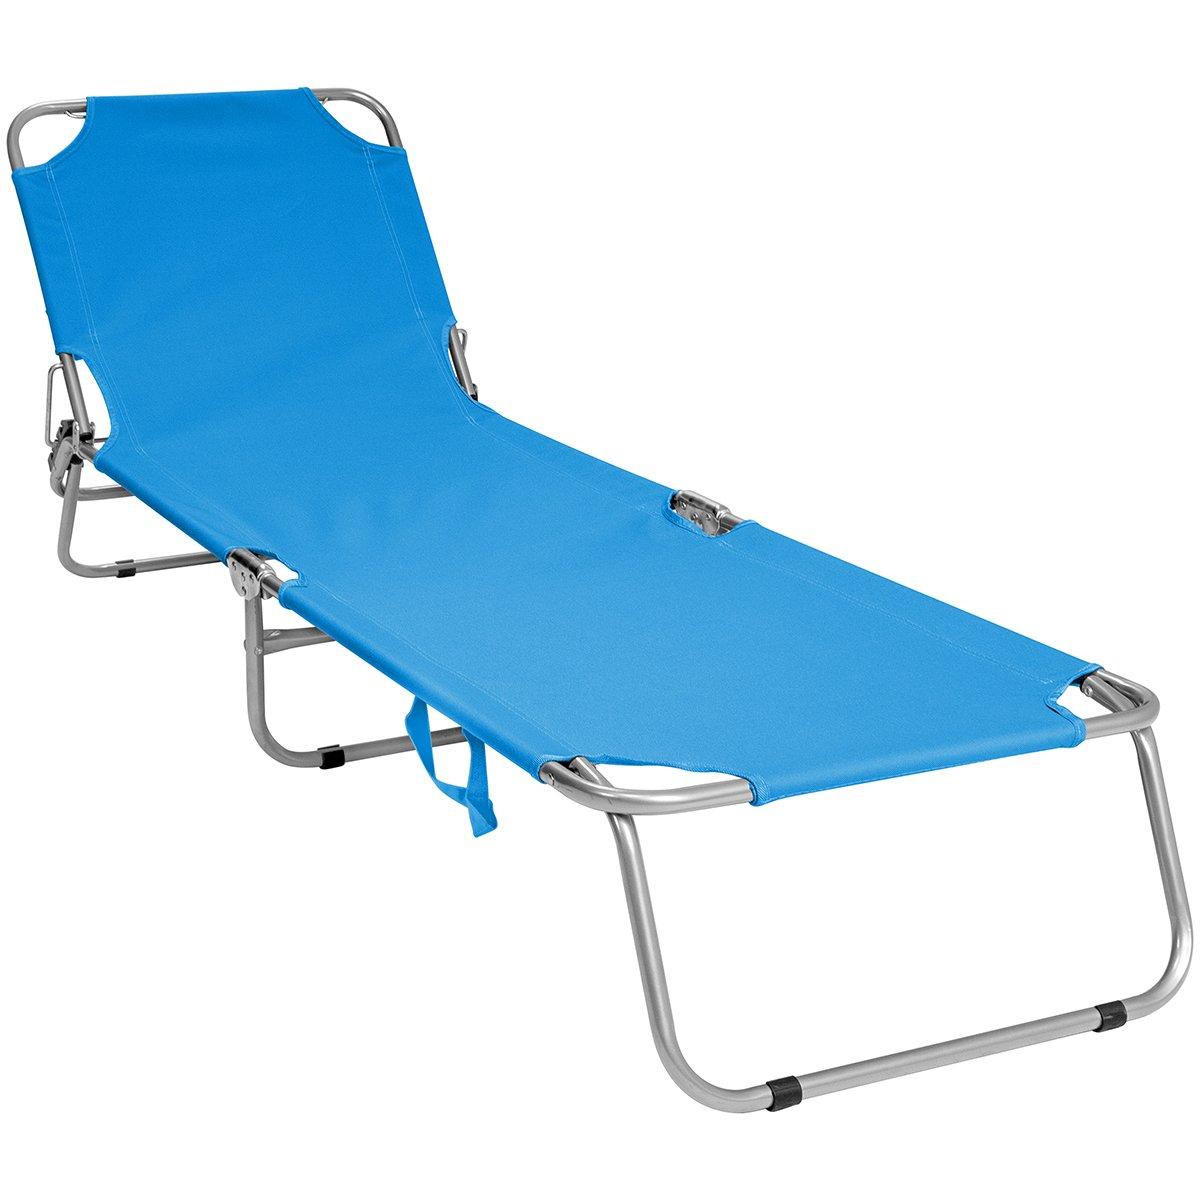 Charles Bentley Foldable Camping Sun Lounger Sun Bed Recliner Garden Black